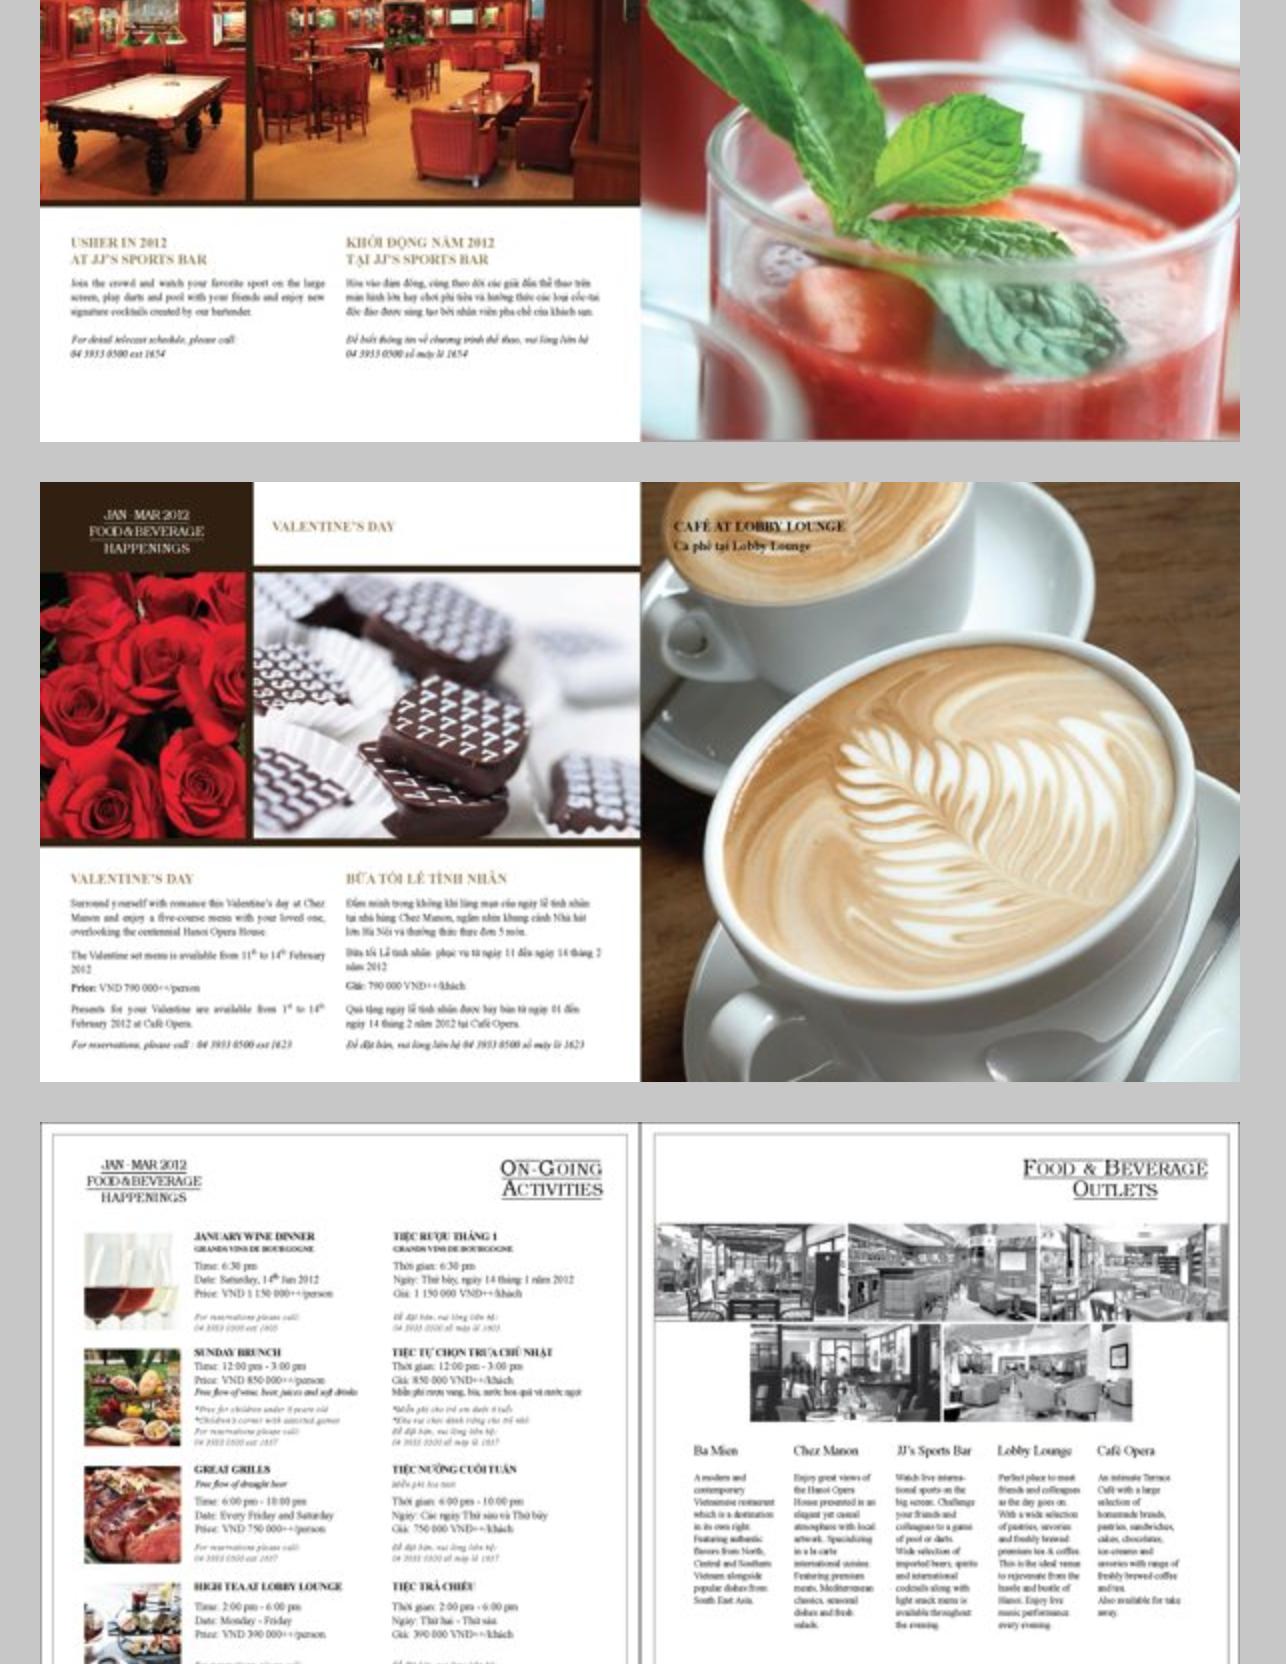 Hilton/ F&B brochure by Vu Linh Ha, via Behance